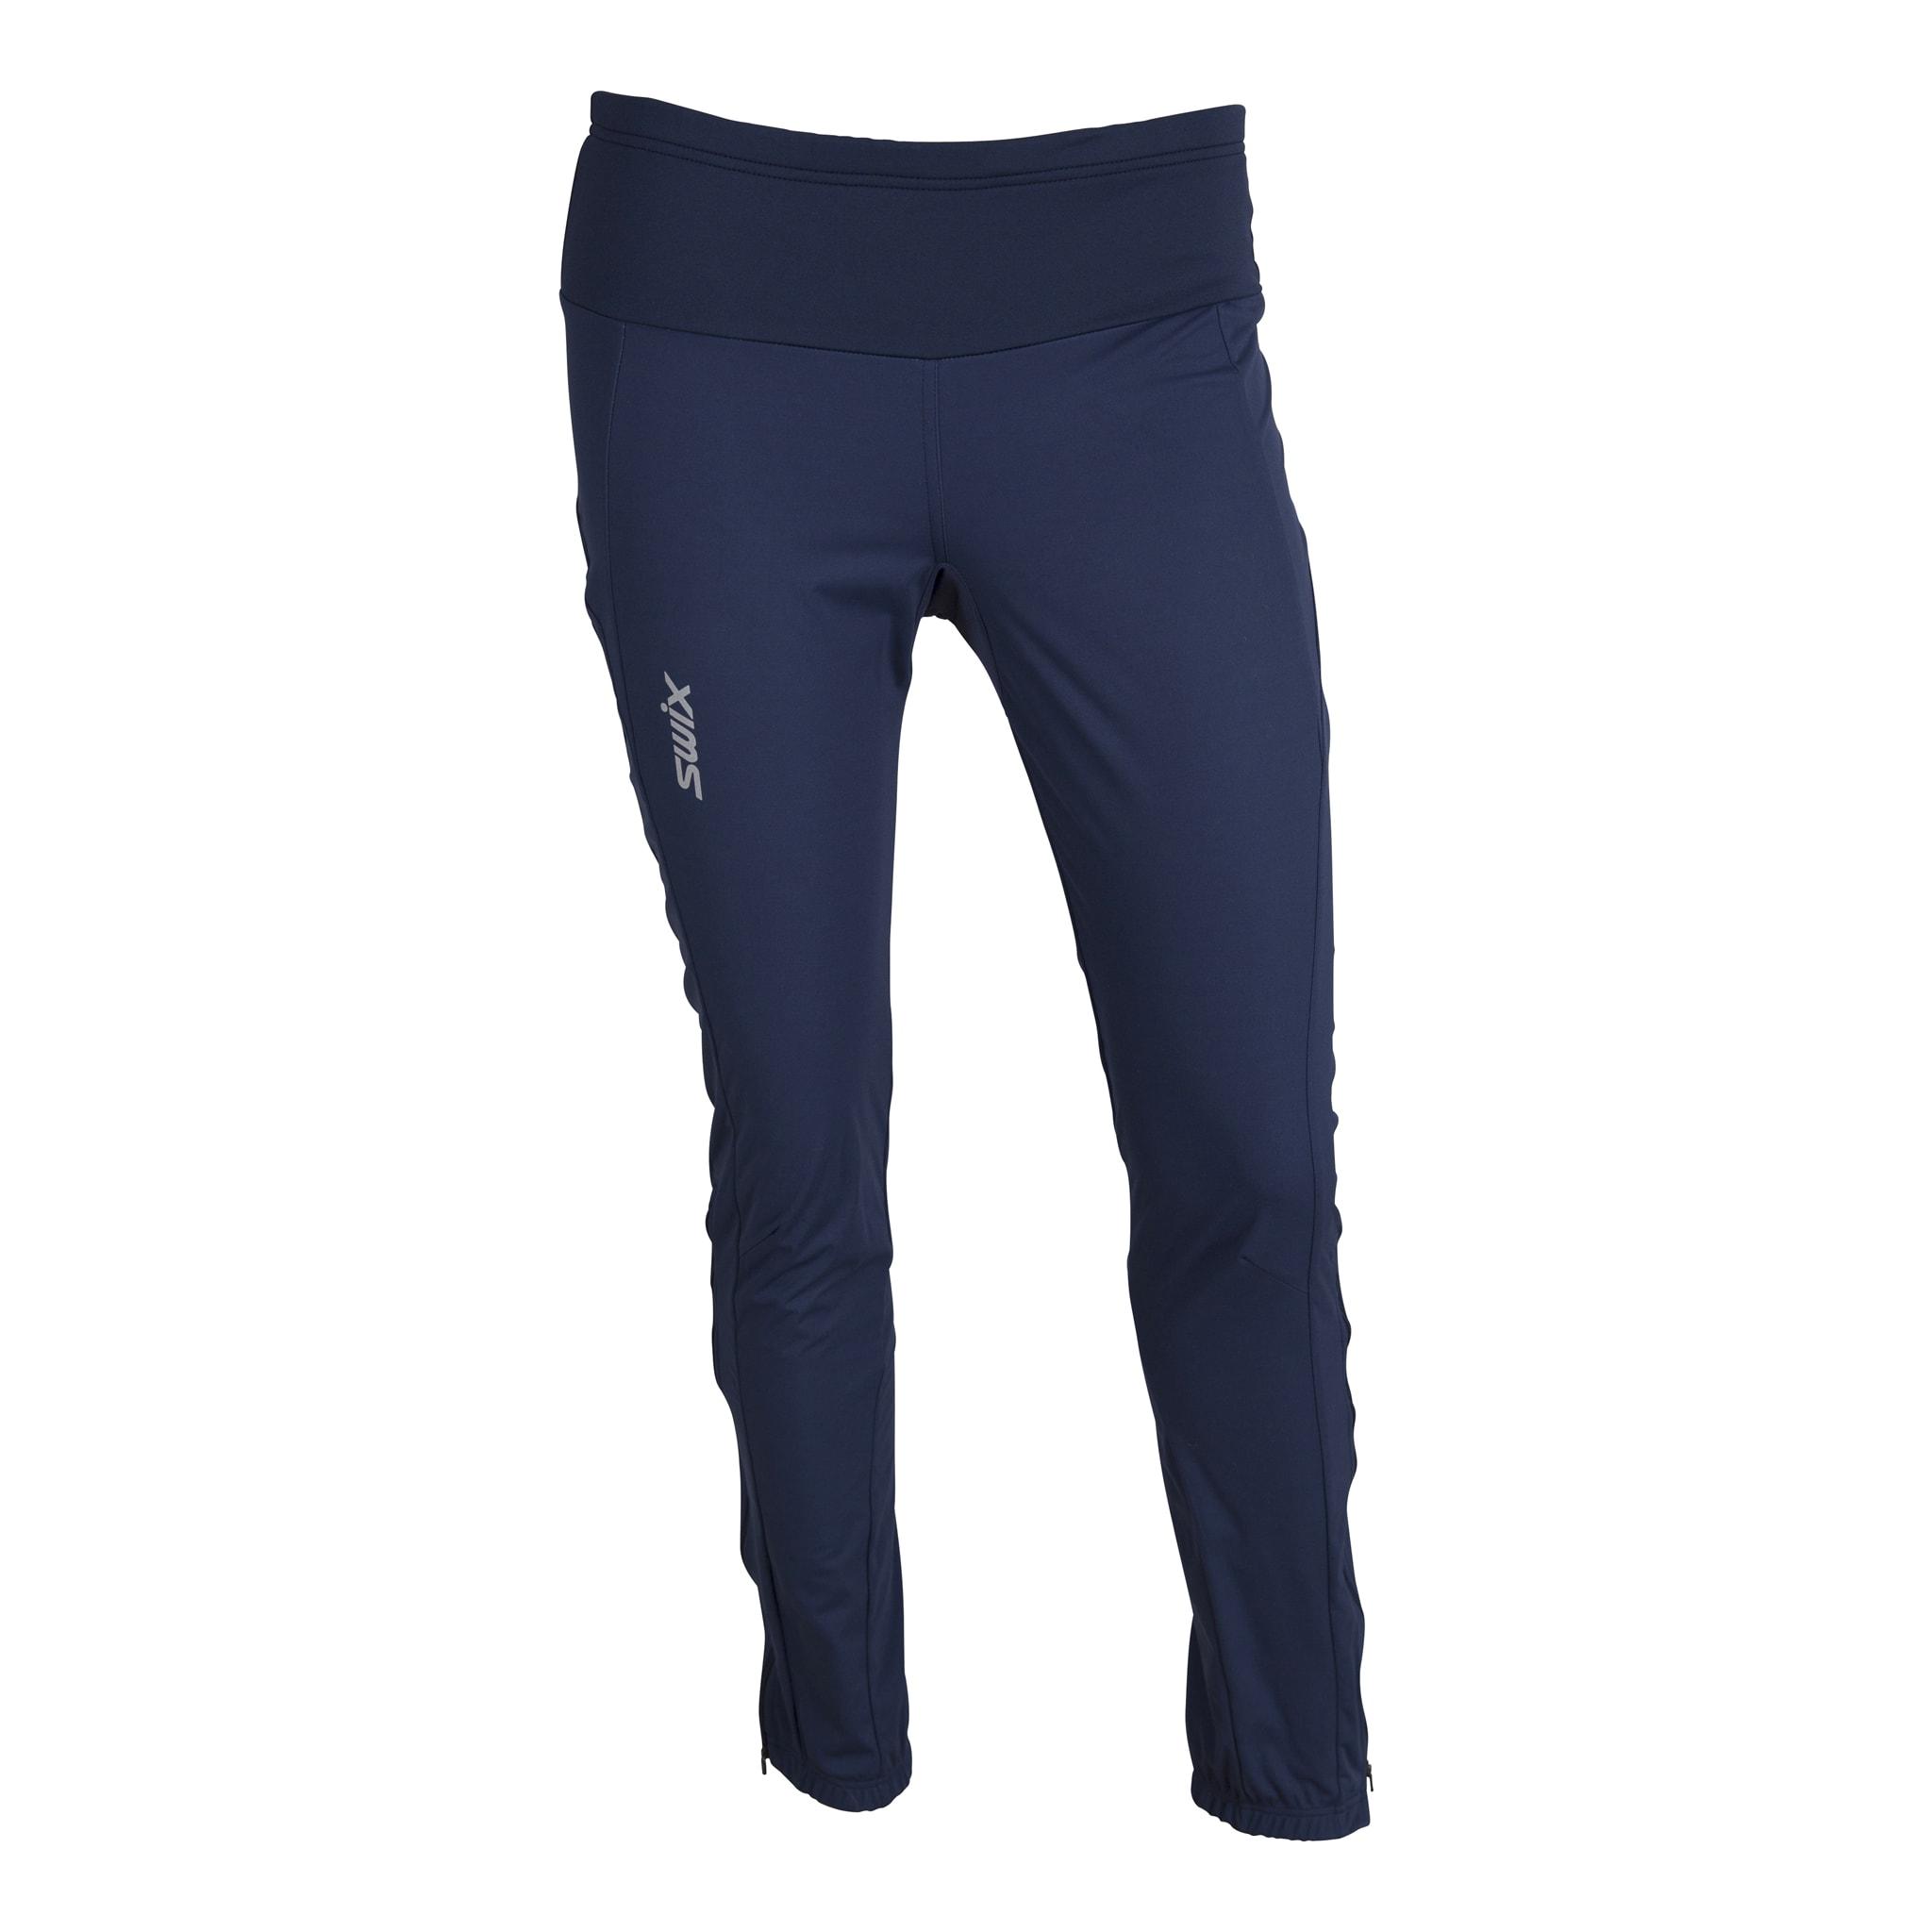 Lett 3lags softshell-bukse